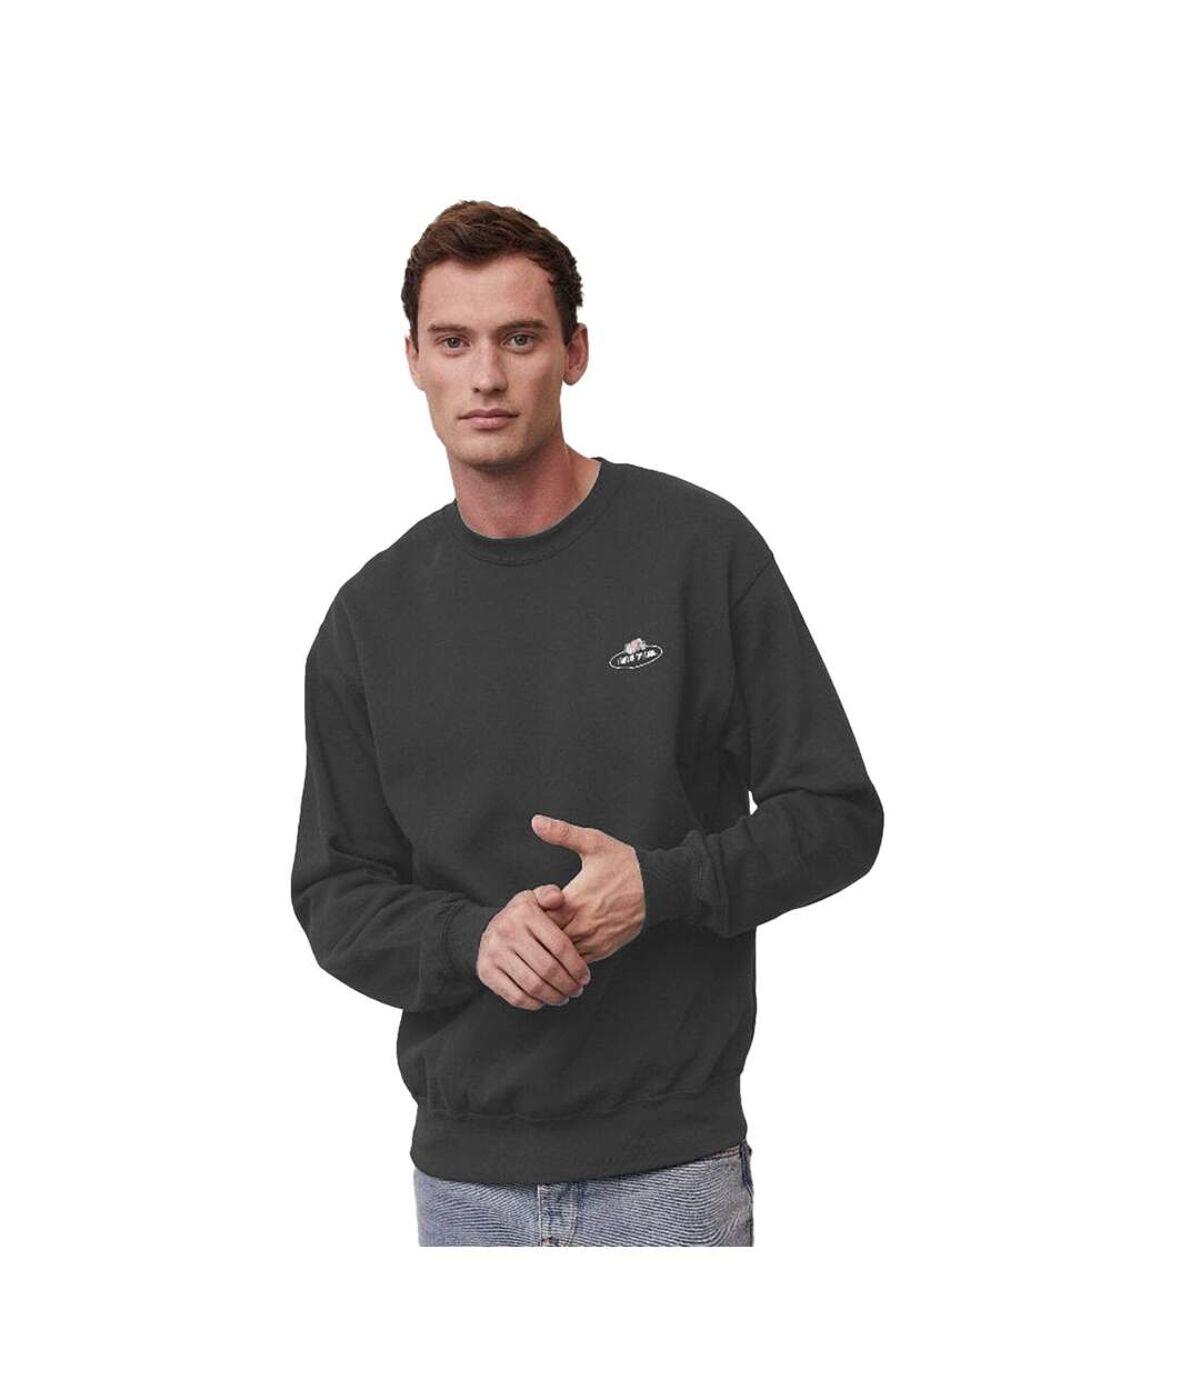 Fruit of the Loom Mens Small Logo Vintage Sweatshirt (Deep Navy) - UTPC4349